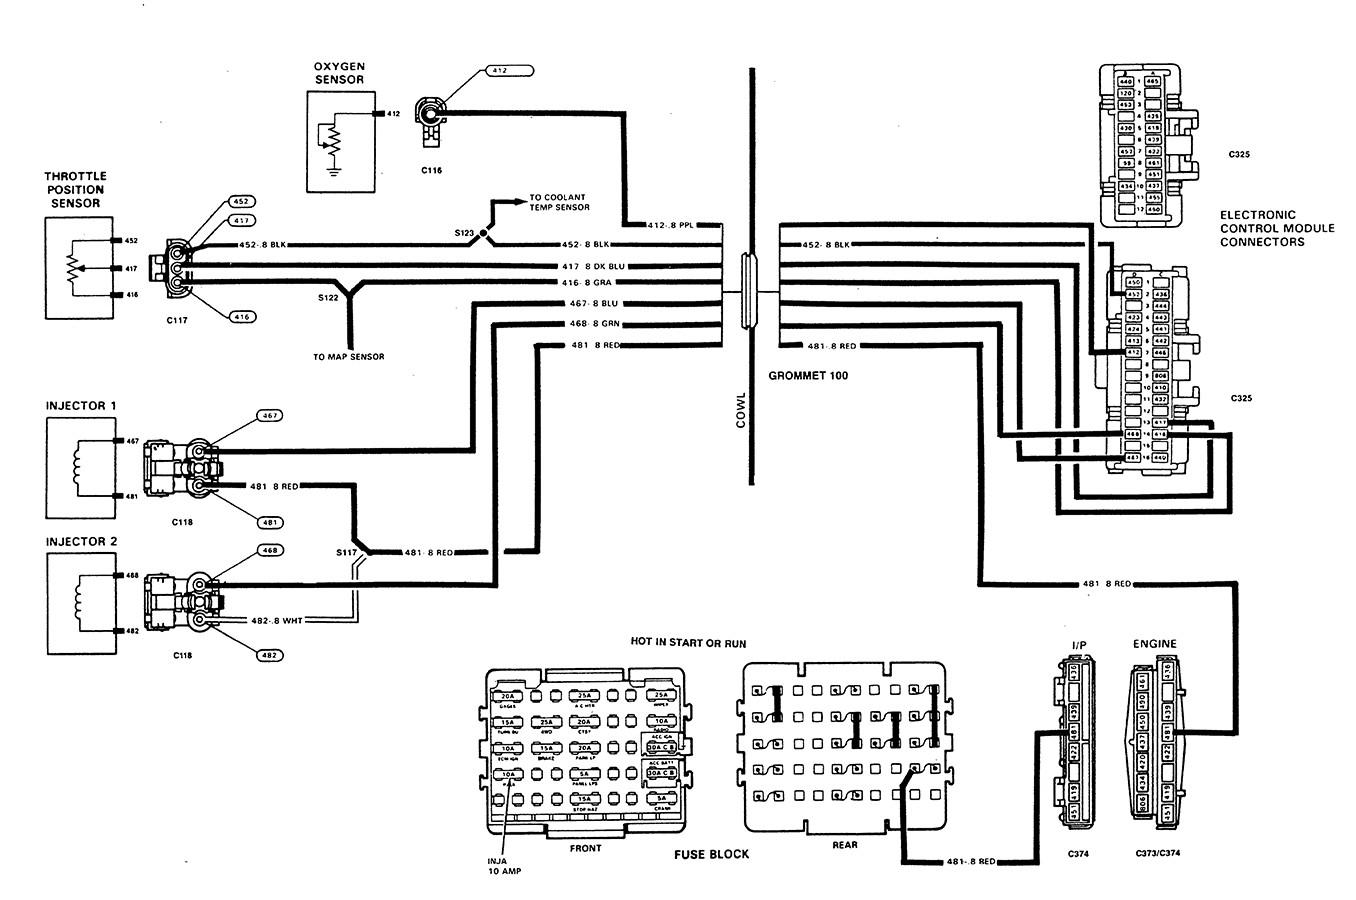 4 Wire Oxygen Sensor Diagram Toyota